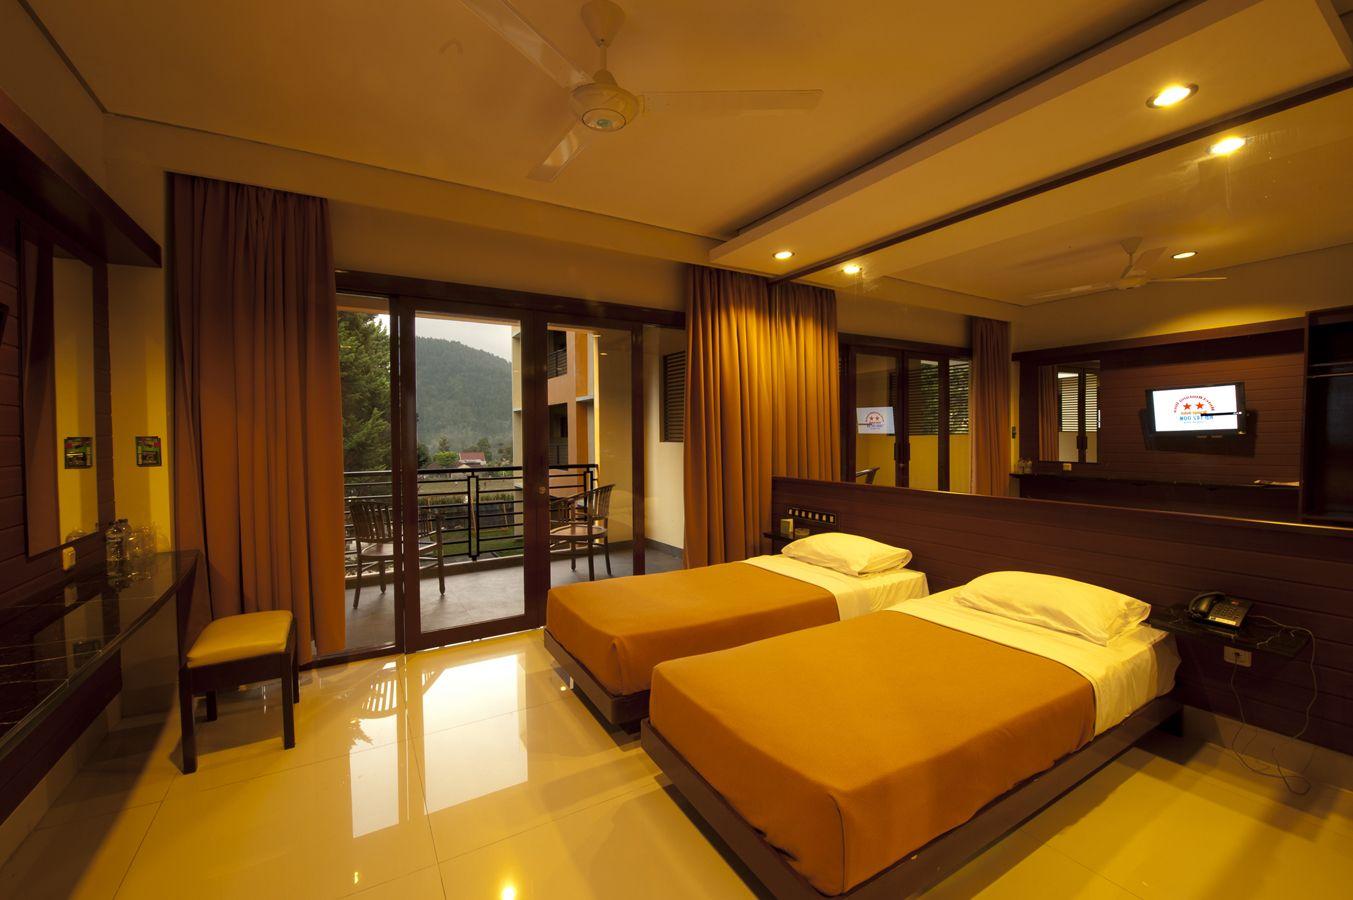 Hotel Bintang Tawangmangu , Karanganyar